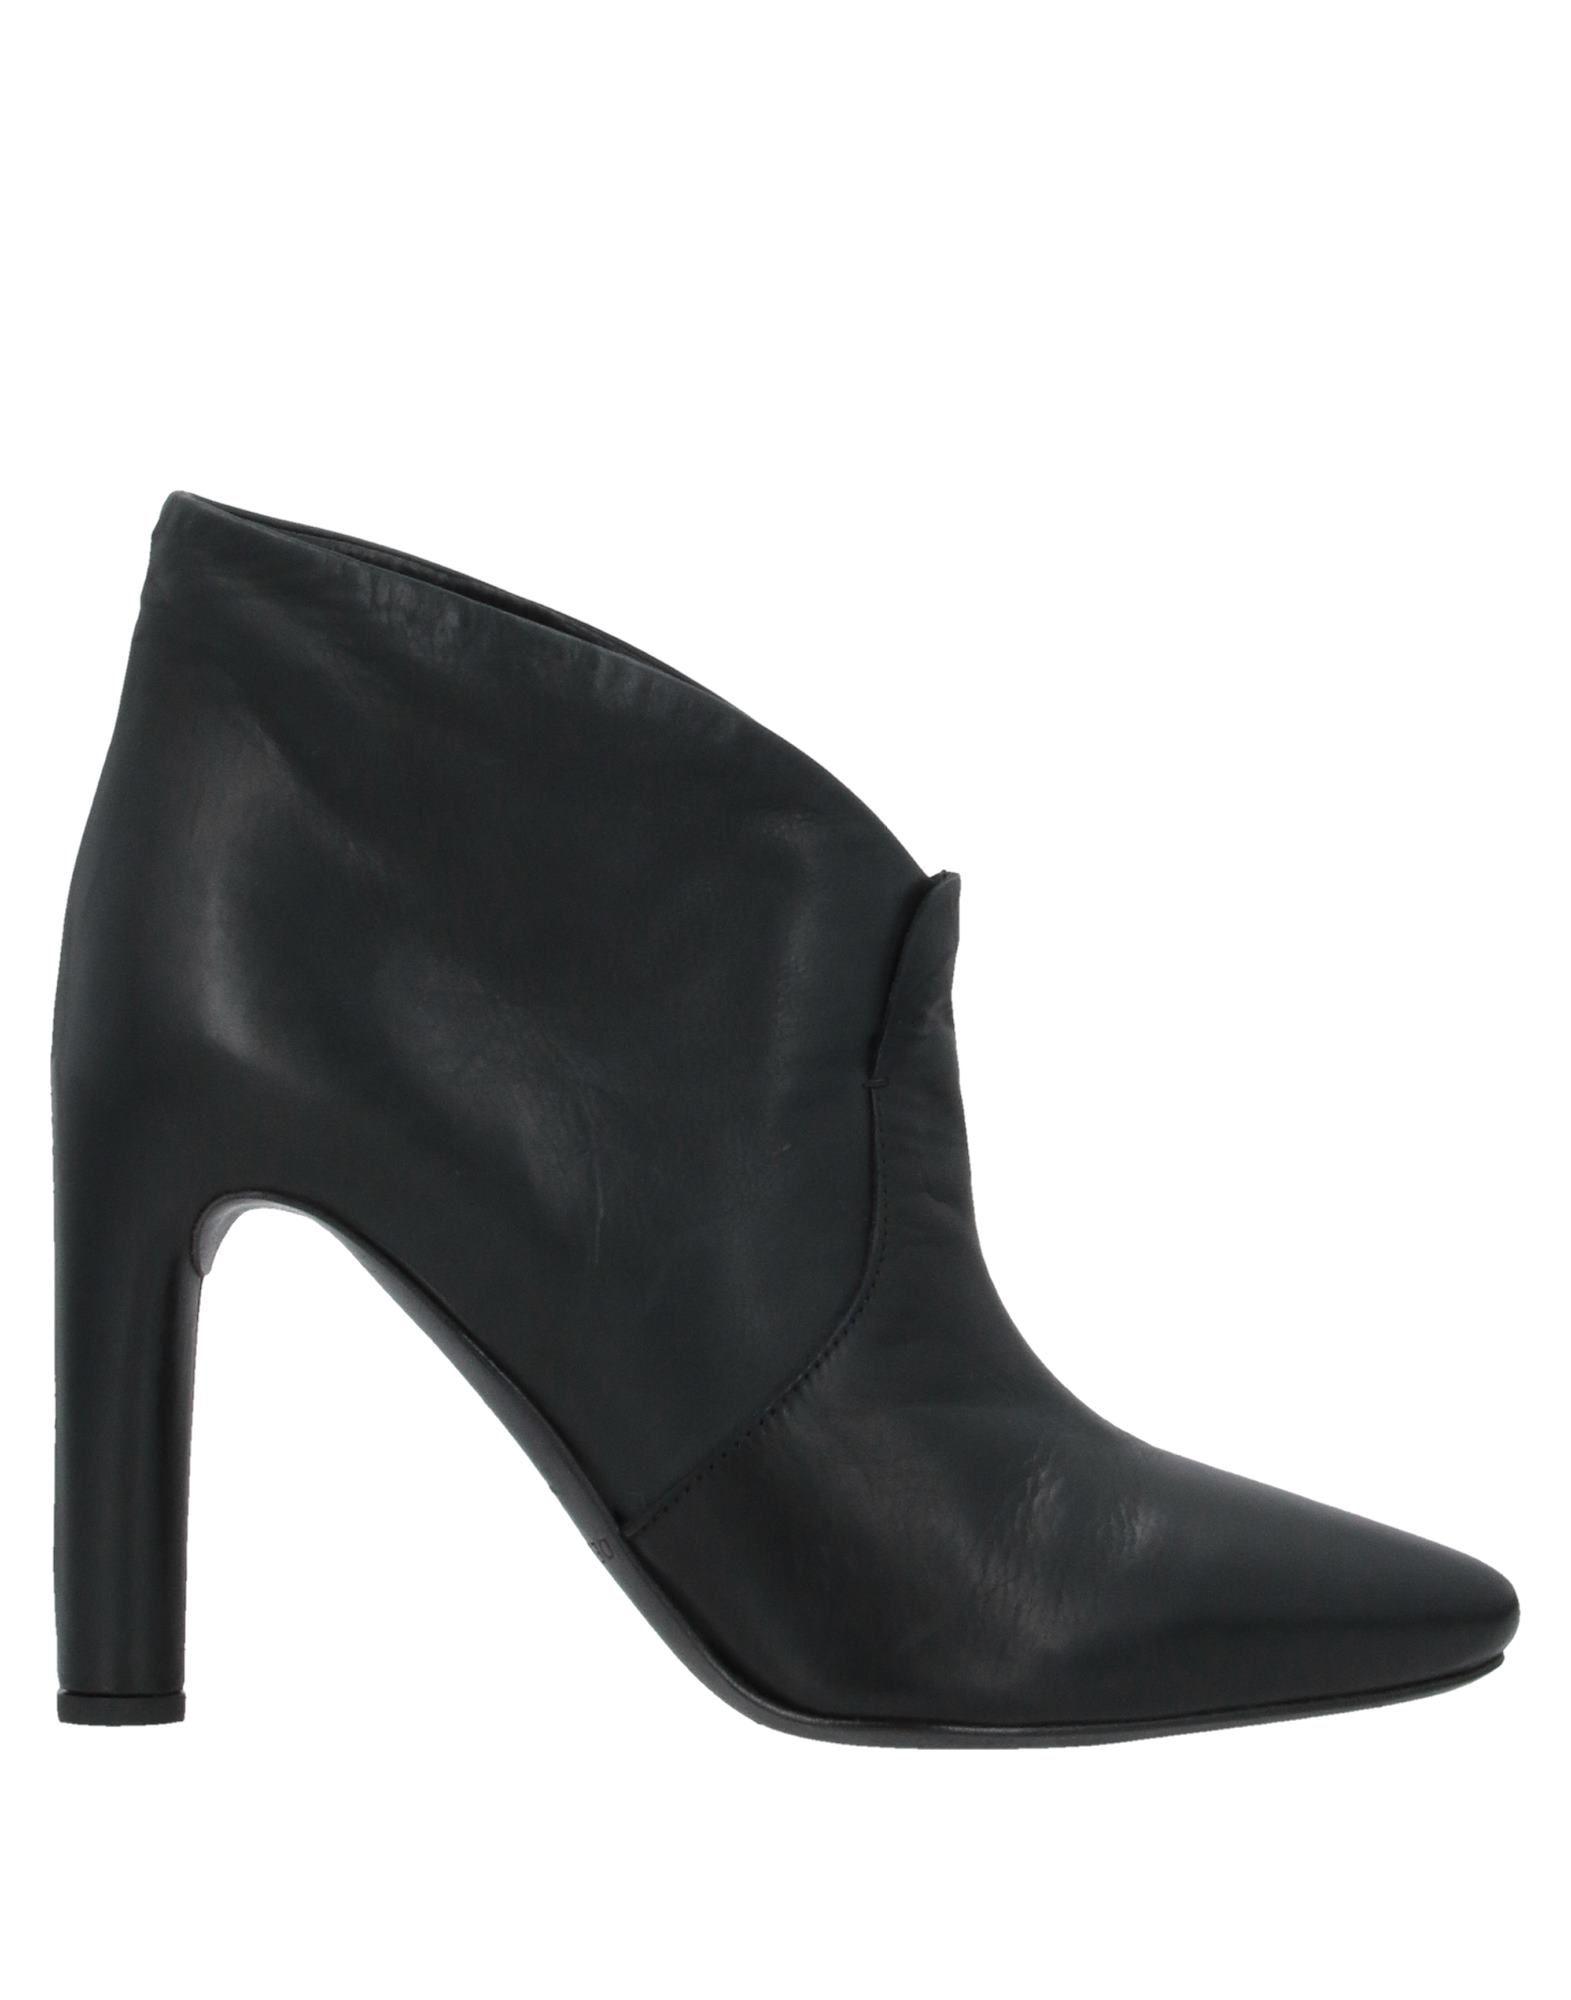 DEL CARLO Полусапоги и высокие ботинки del carlo полусапоги и высокие ботинки